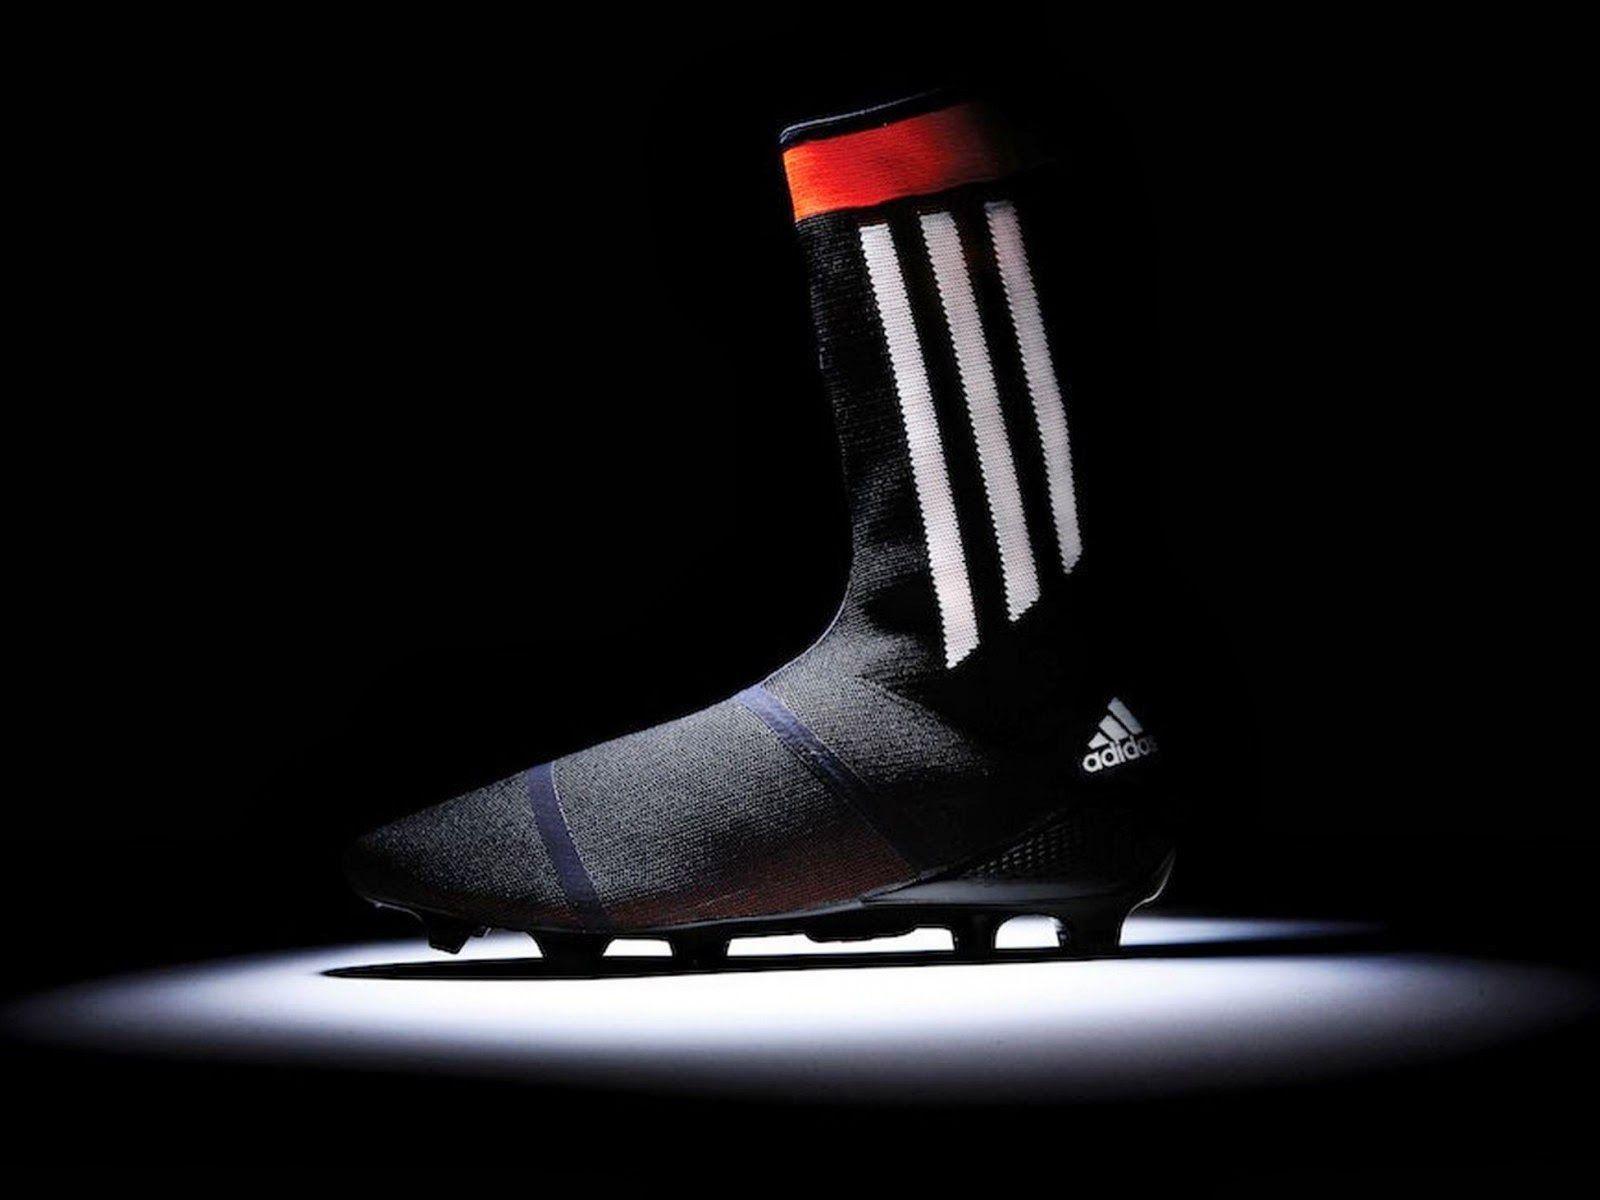 Adidas Nemeziz Wallpaper Logo Wallpaper In 2020 Adidas Boots Boots Adidas Wallpapers